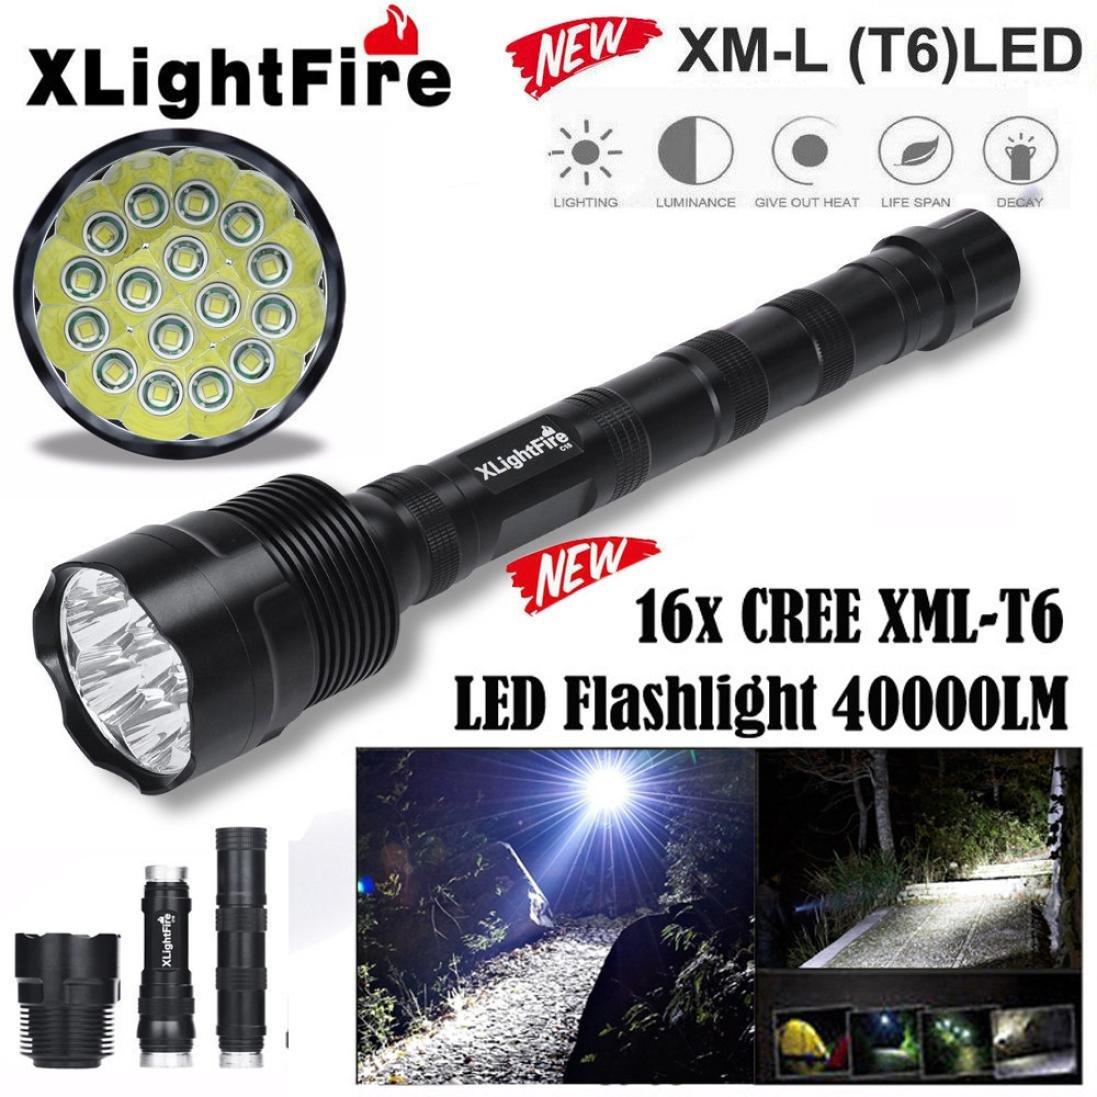 Handheld Flashlights,Lookatool XLightFire 16x XML T6 5 Mode 18650 Super Bright LED Flashlight